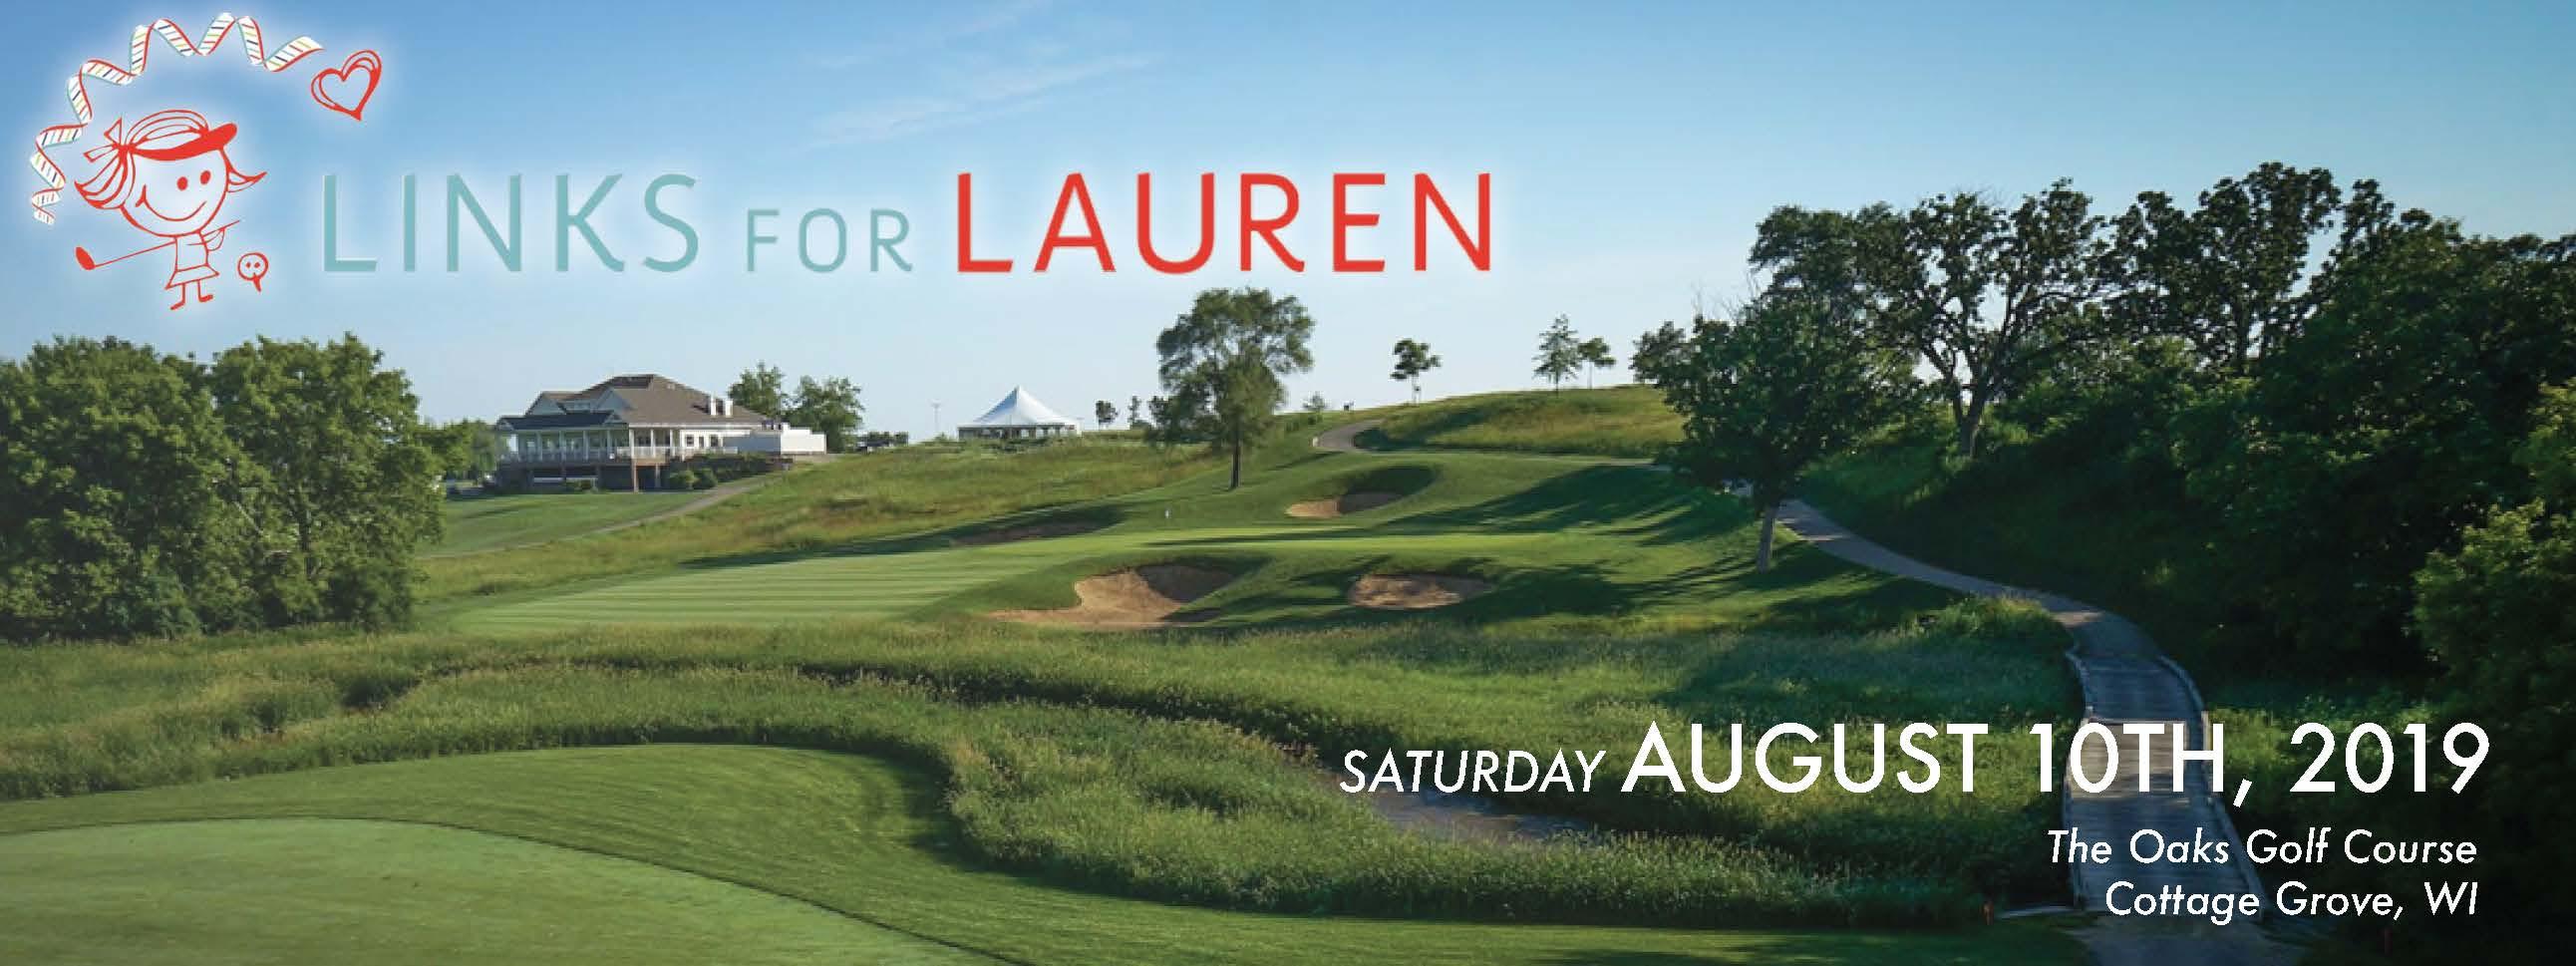 Links for Lauren NF North Central Event